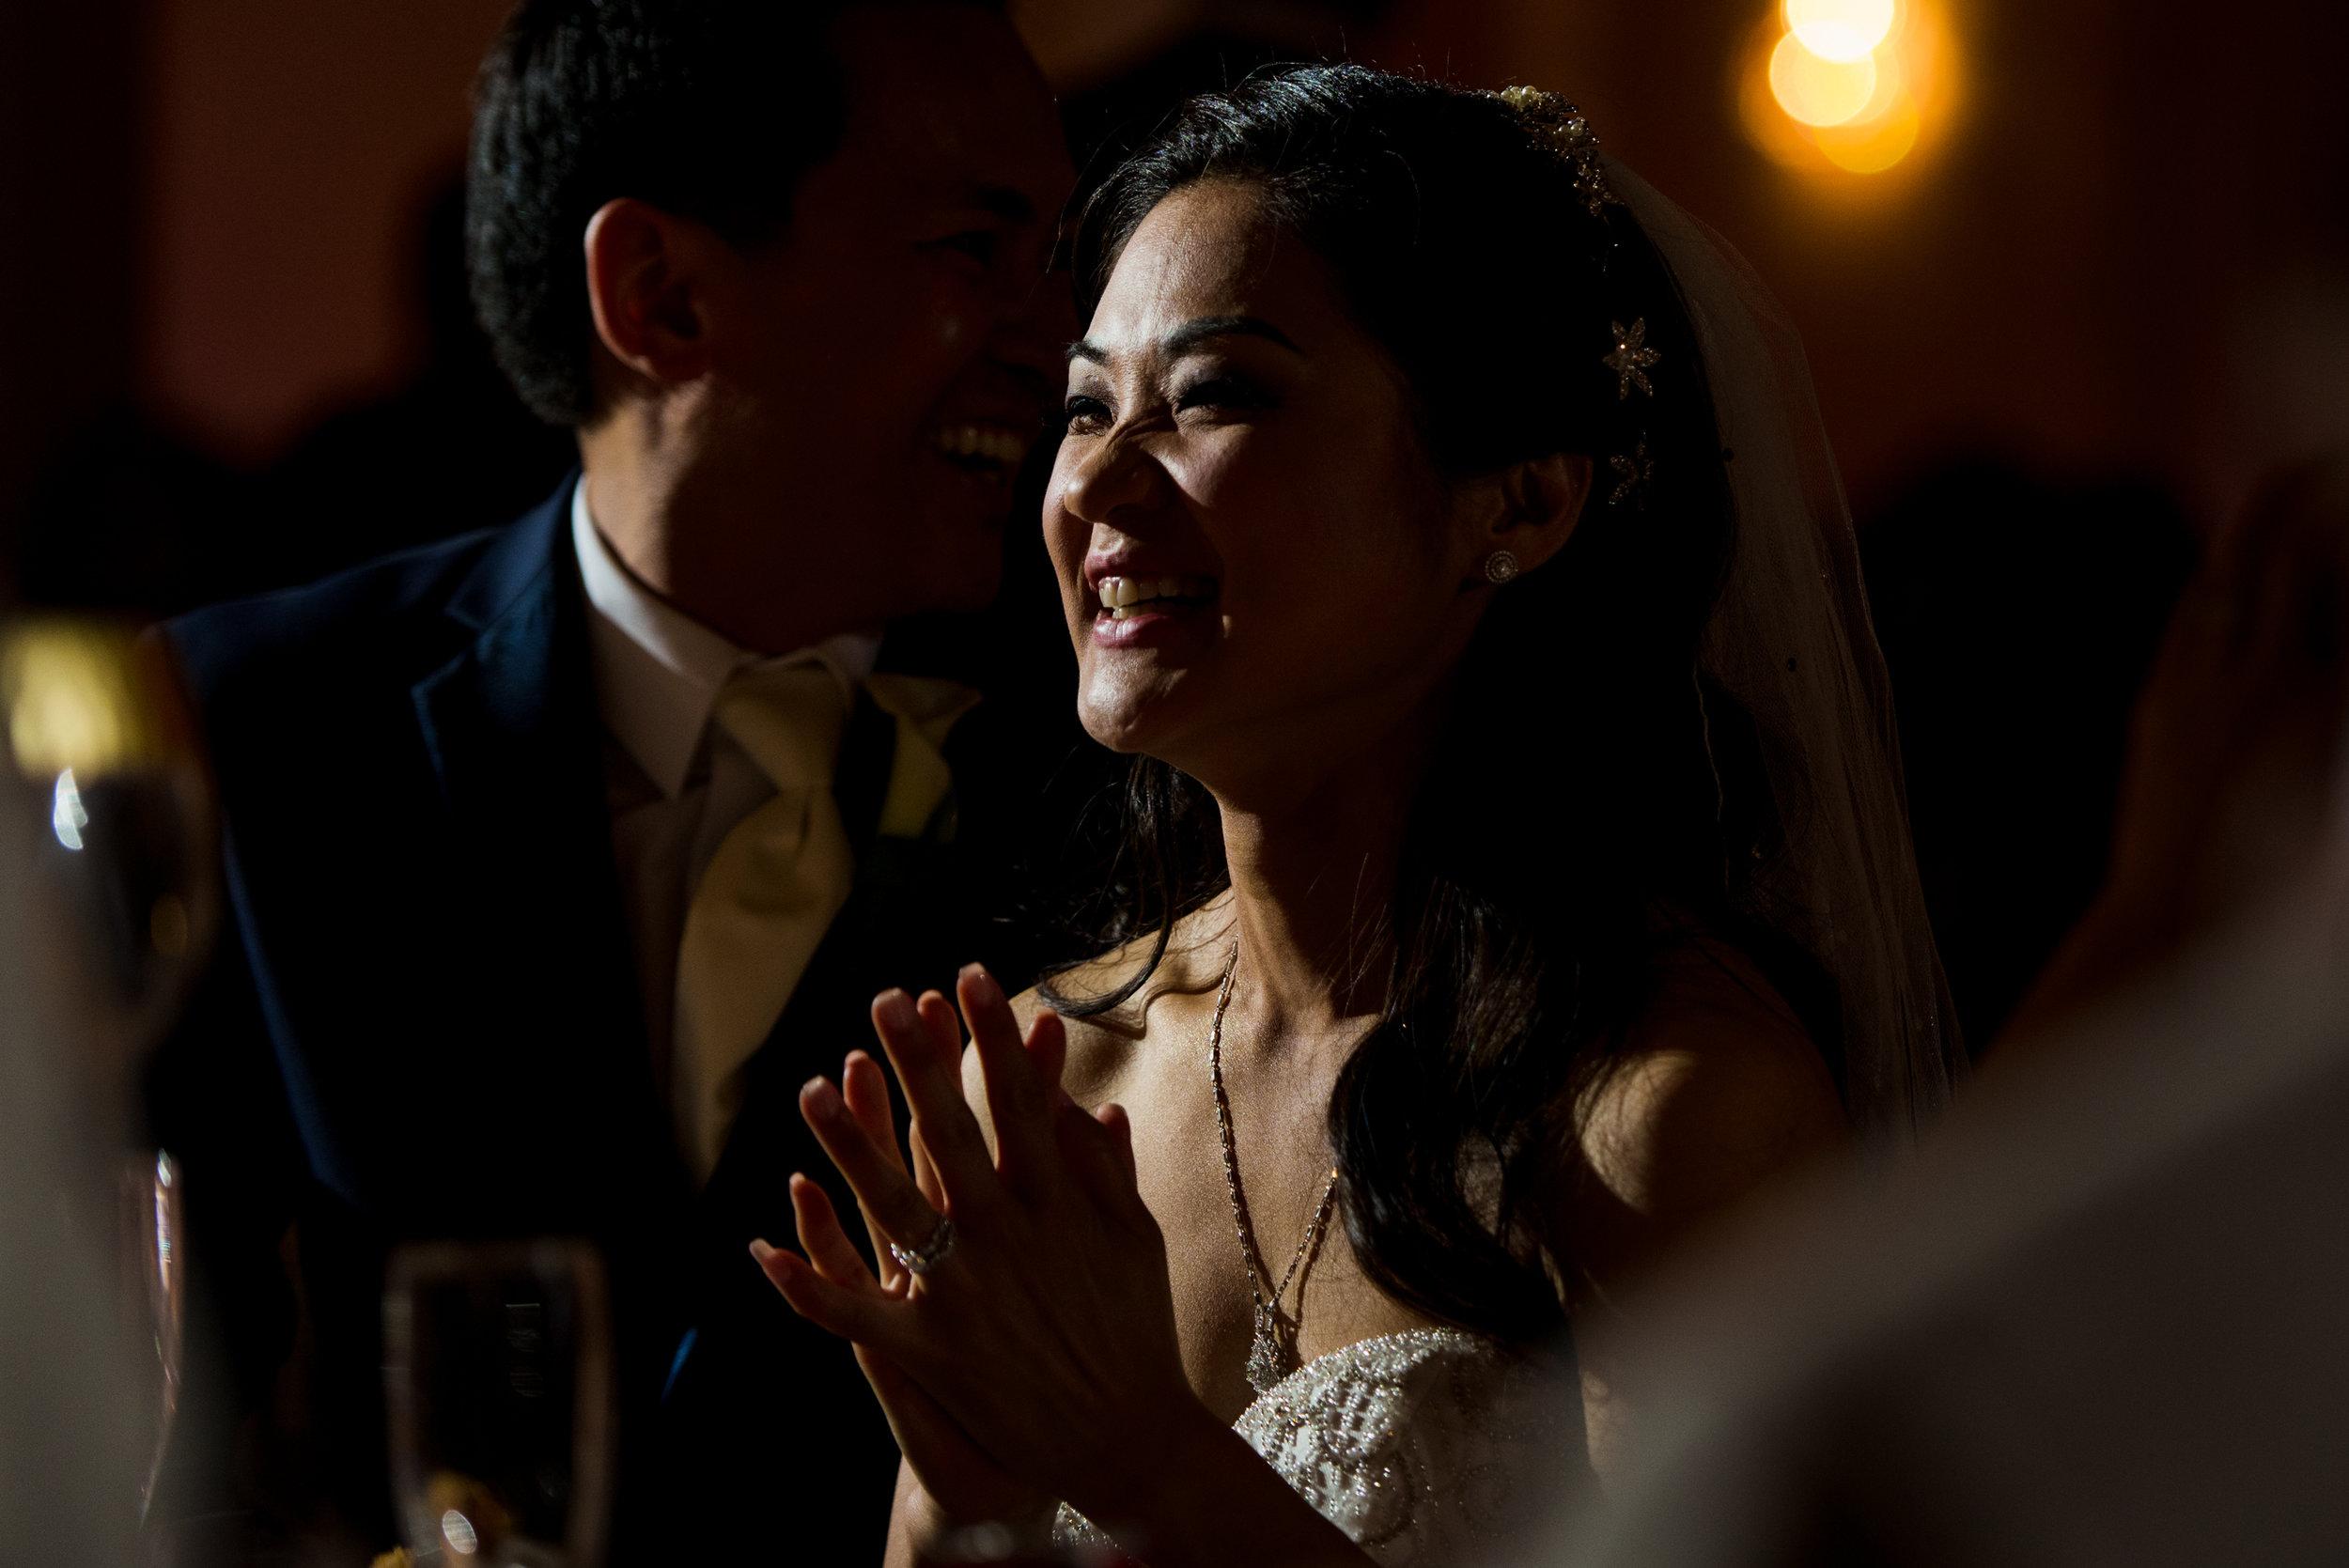 cece-david-wedding-bridal-reception-137.jpg